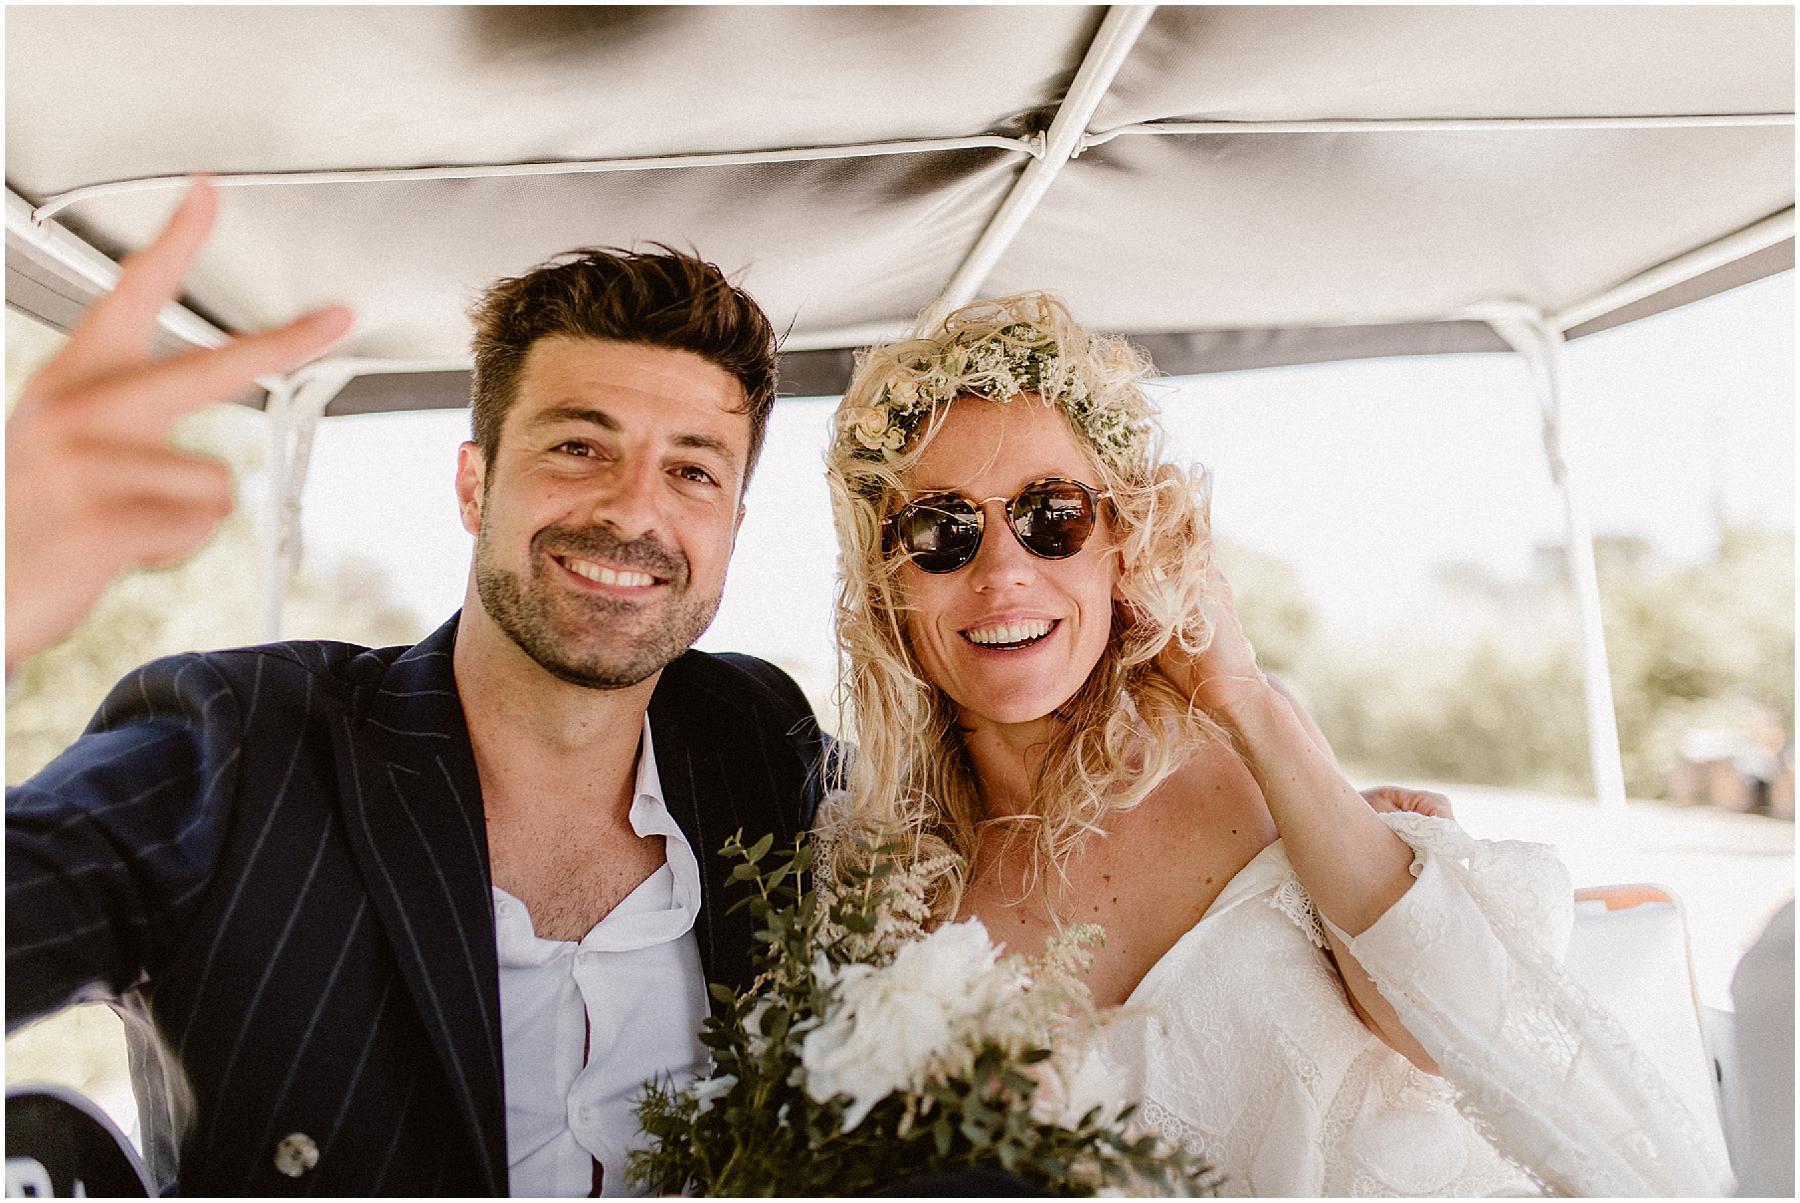 Mariage boheme Saint Tropez Mehari